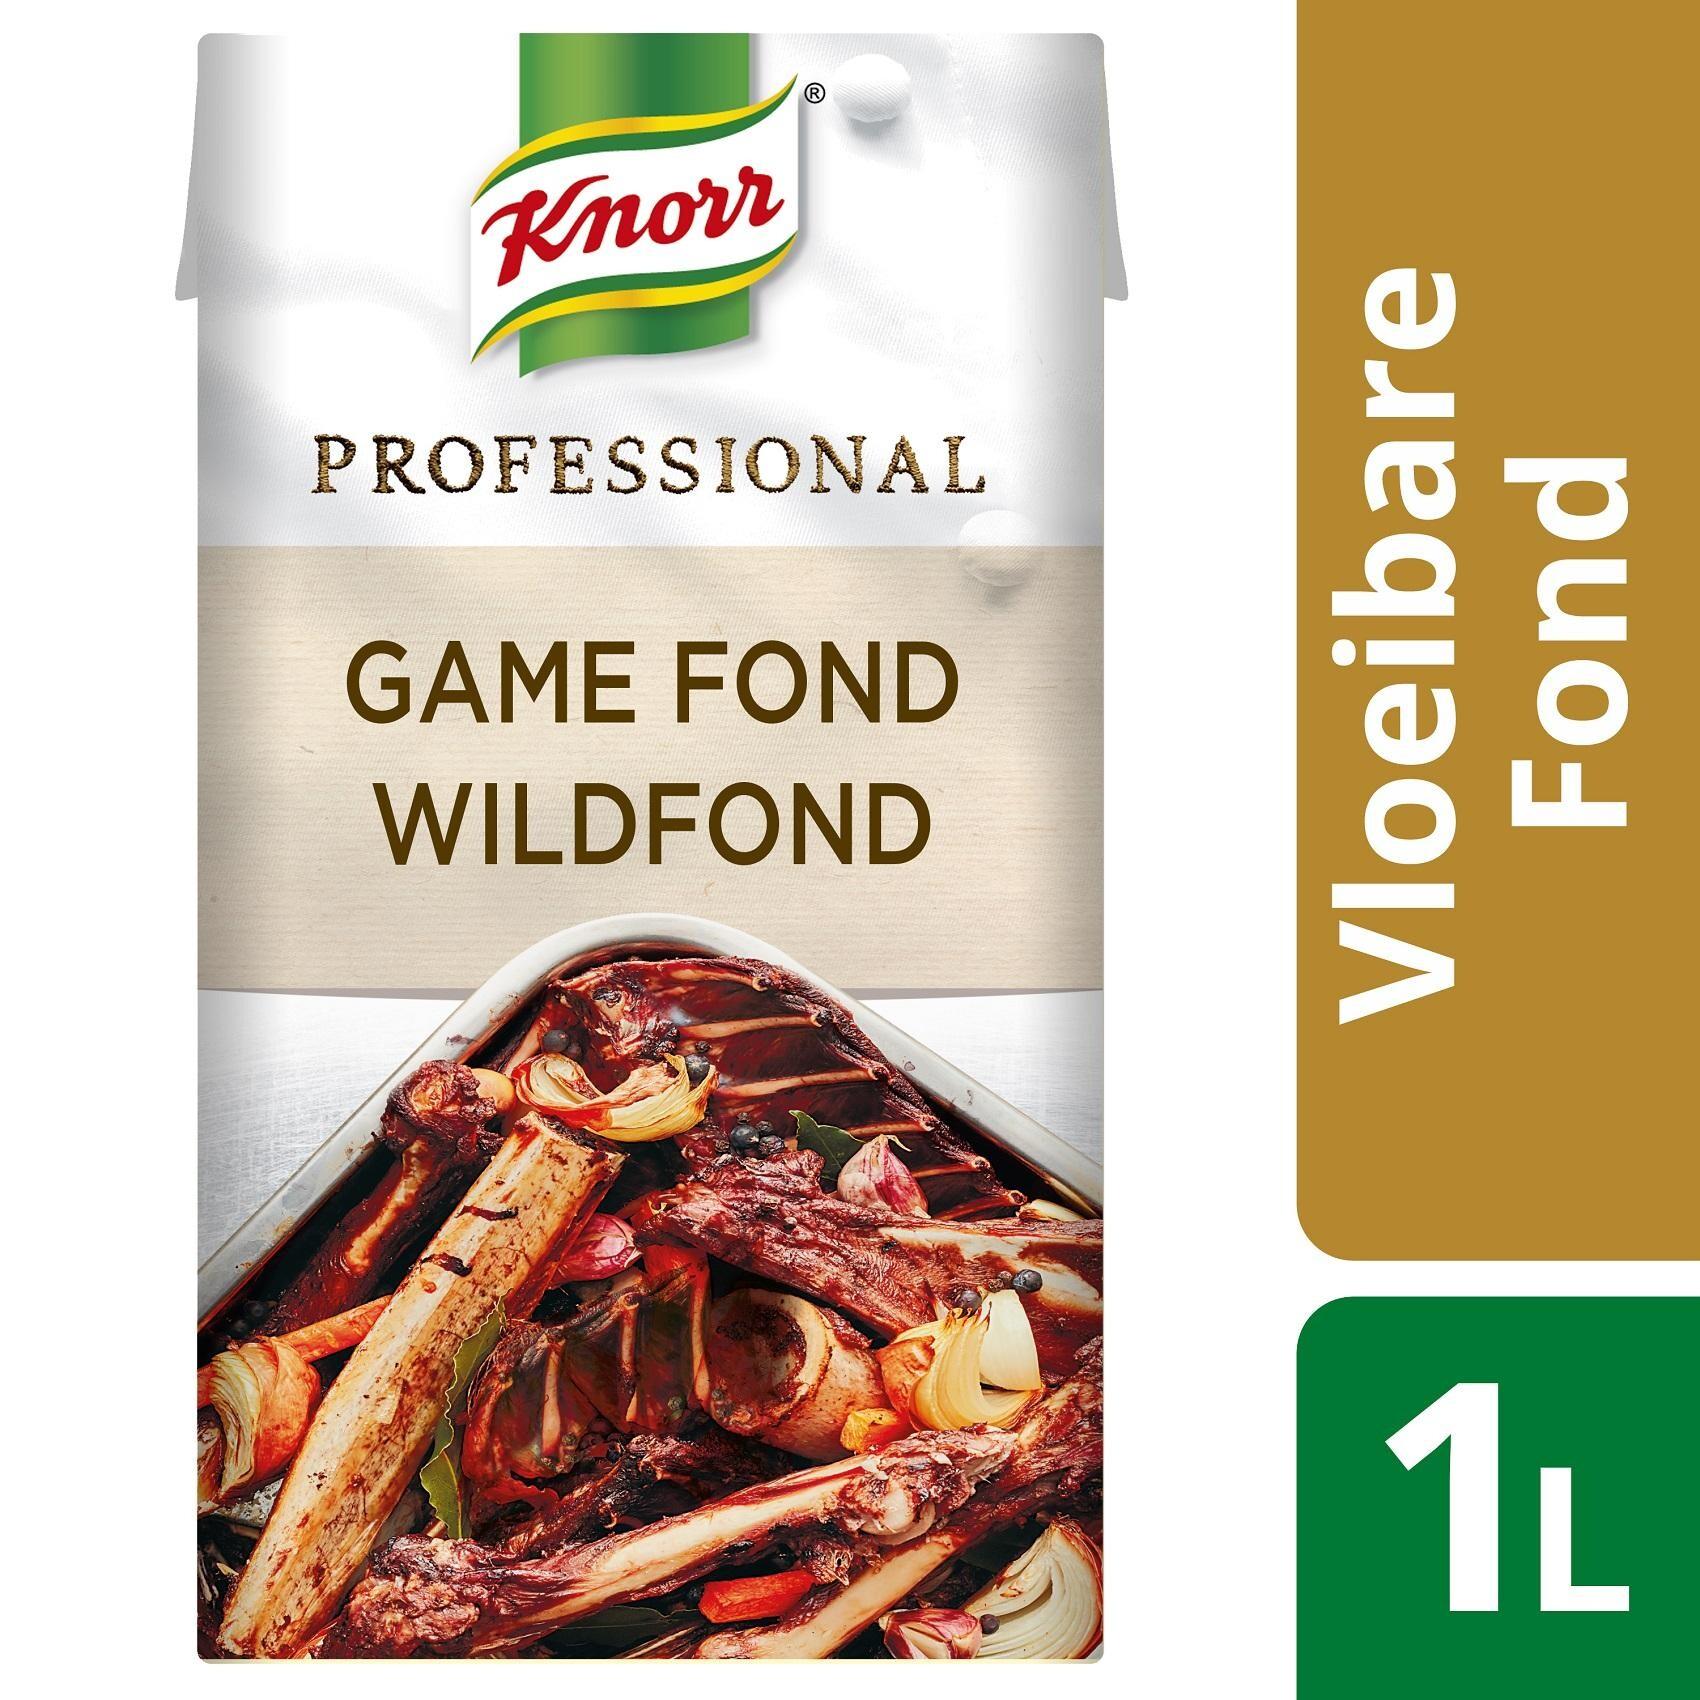 Knorr Liquid Game Fond 1L Professional